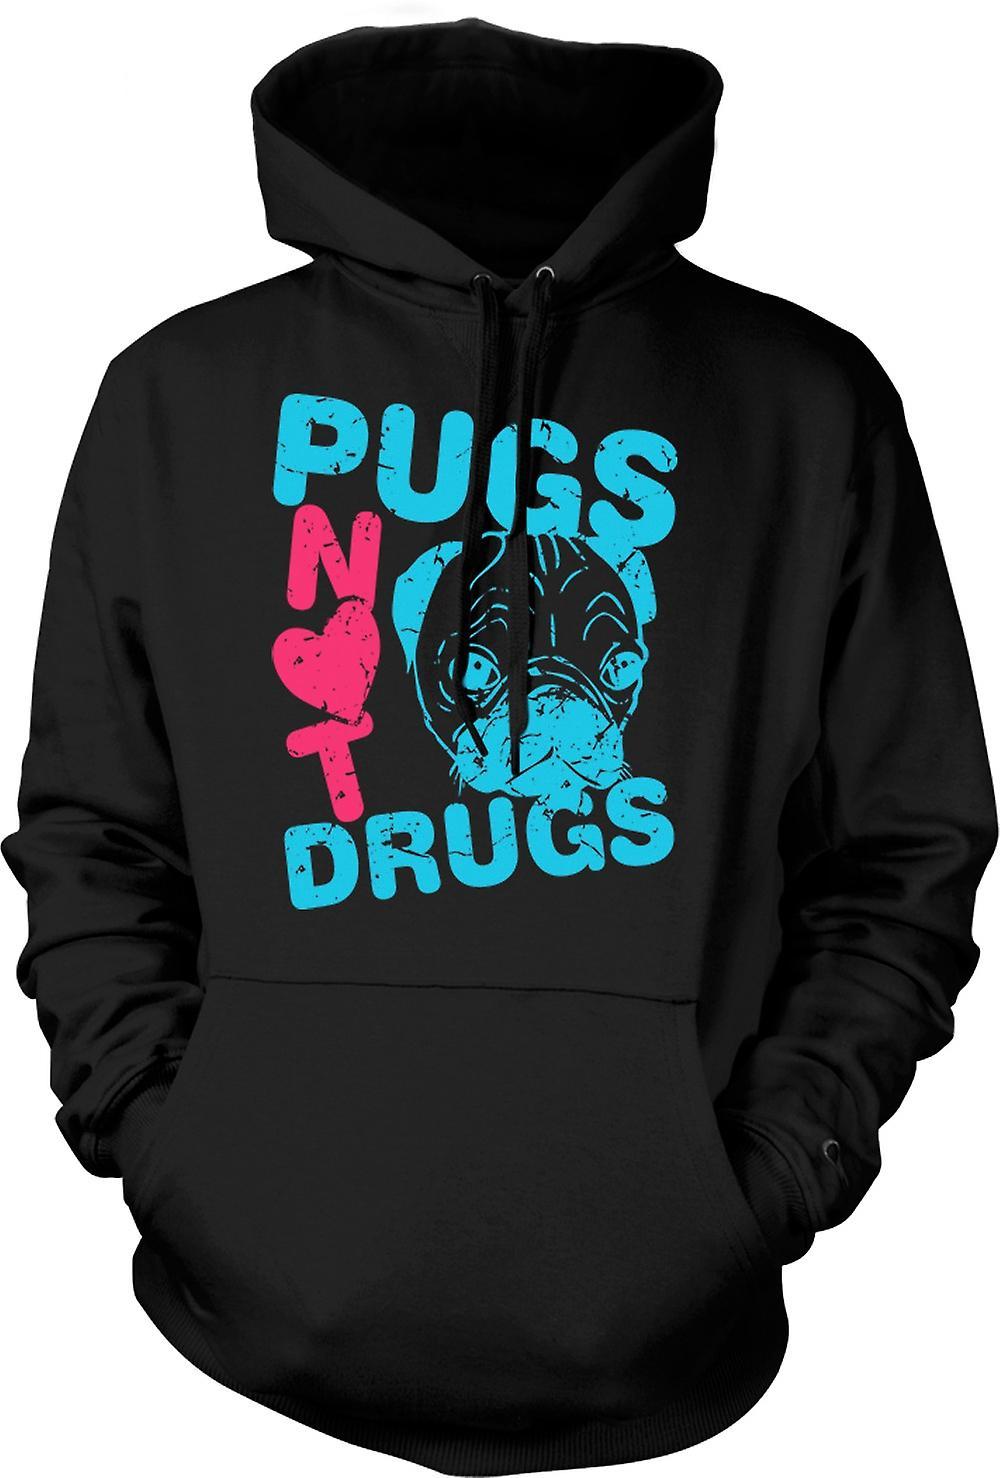 Mens Hoodie - Pugs farmaci non divertente